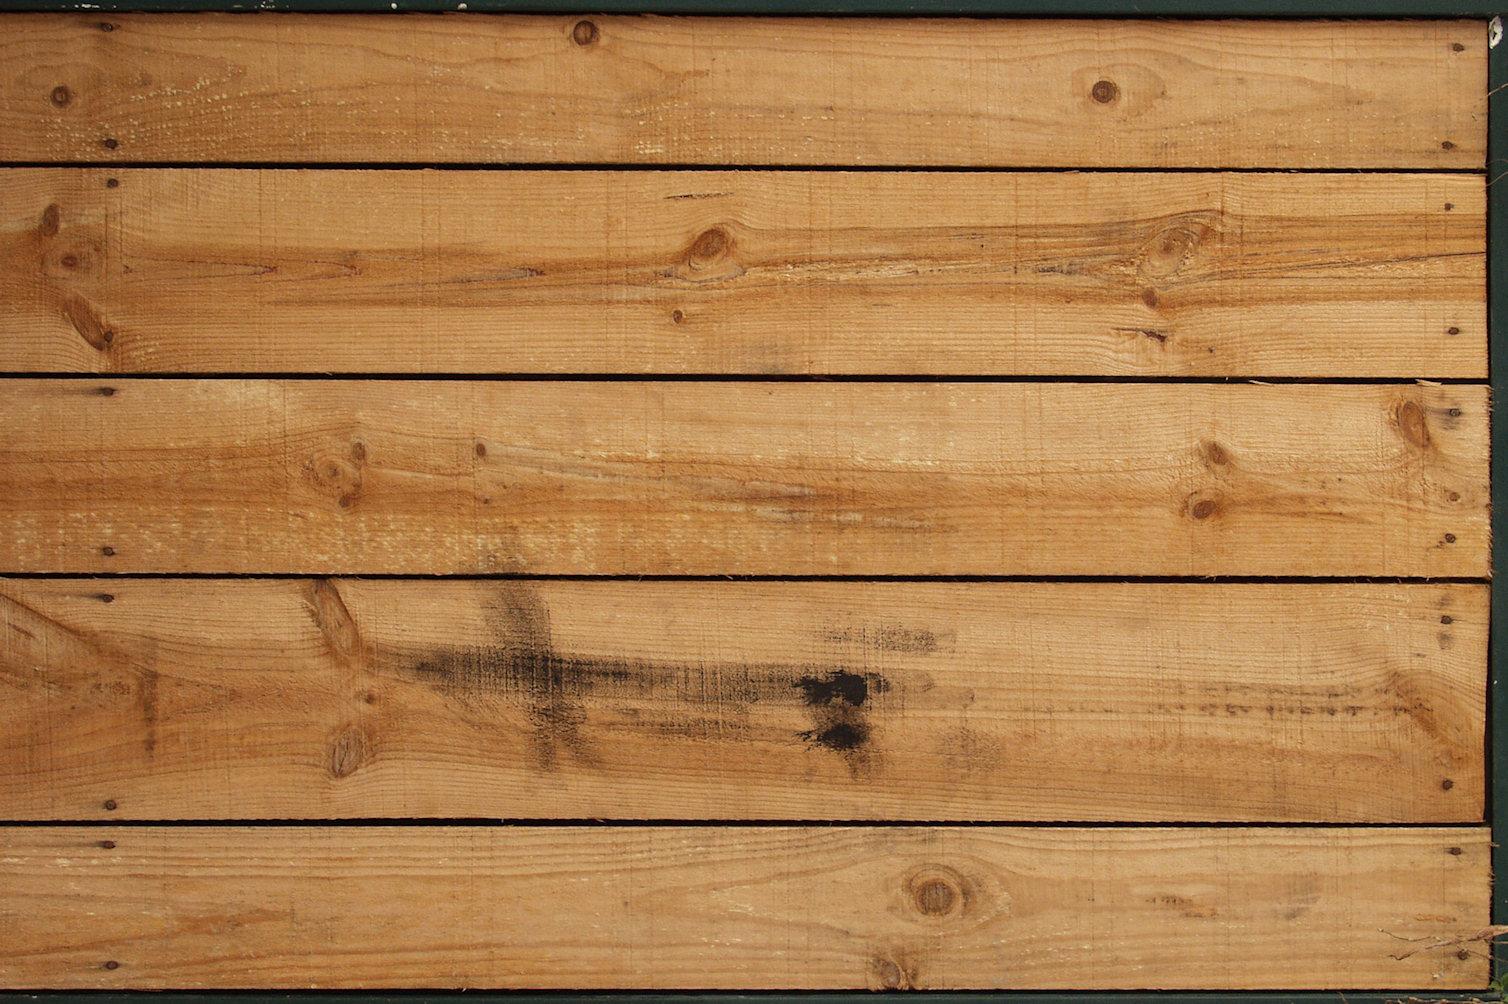 Top Wallpaper Home Screen Wood - tumblr_static_ch4qsyknh08c4k0kow0gwk0ww  Image_274025.jpg